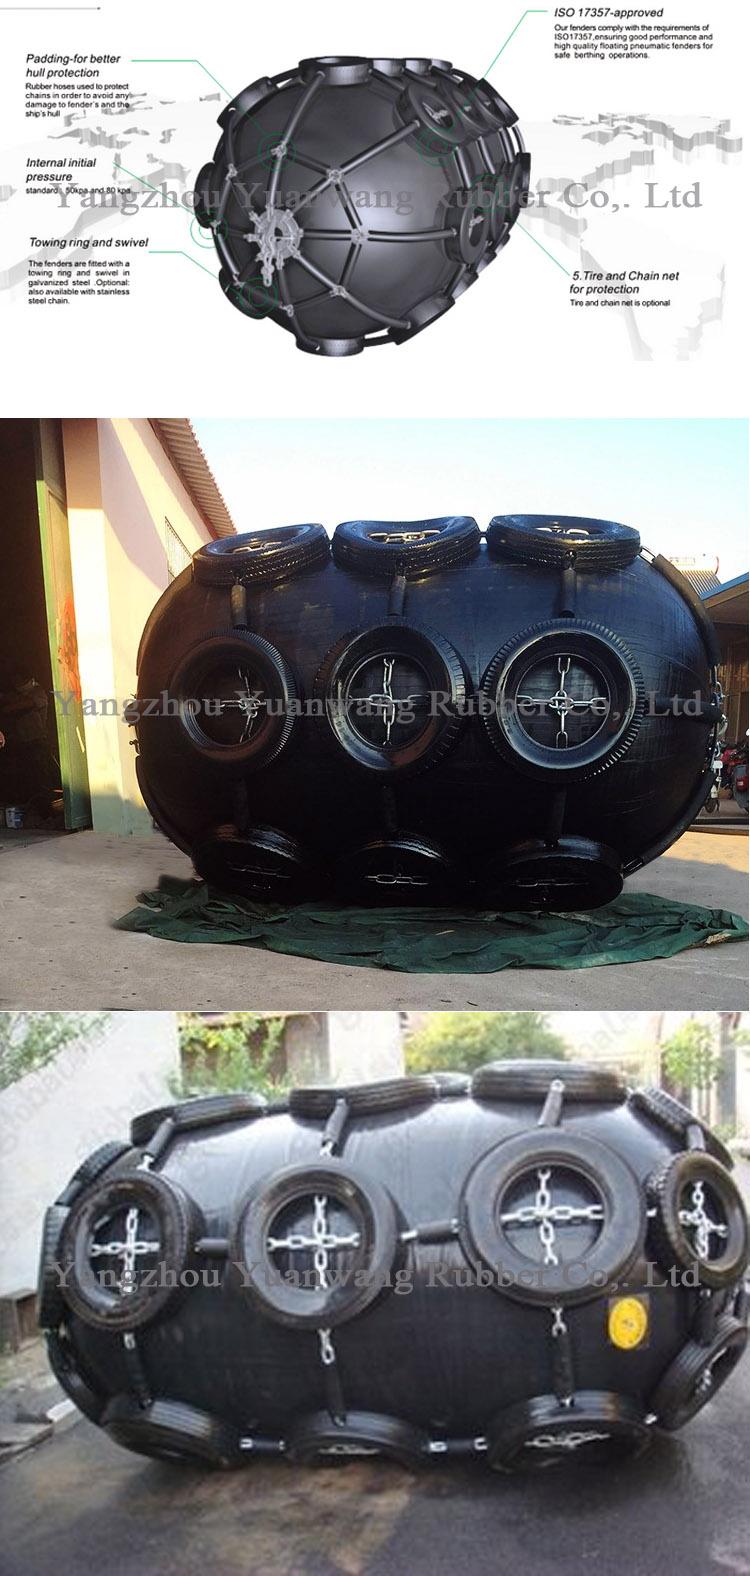 Ship Equipment Anti-Aging Rubber Pneumatic Yokohama Marine Fender